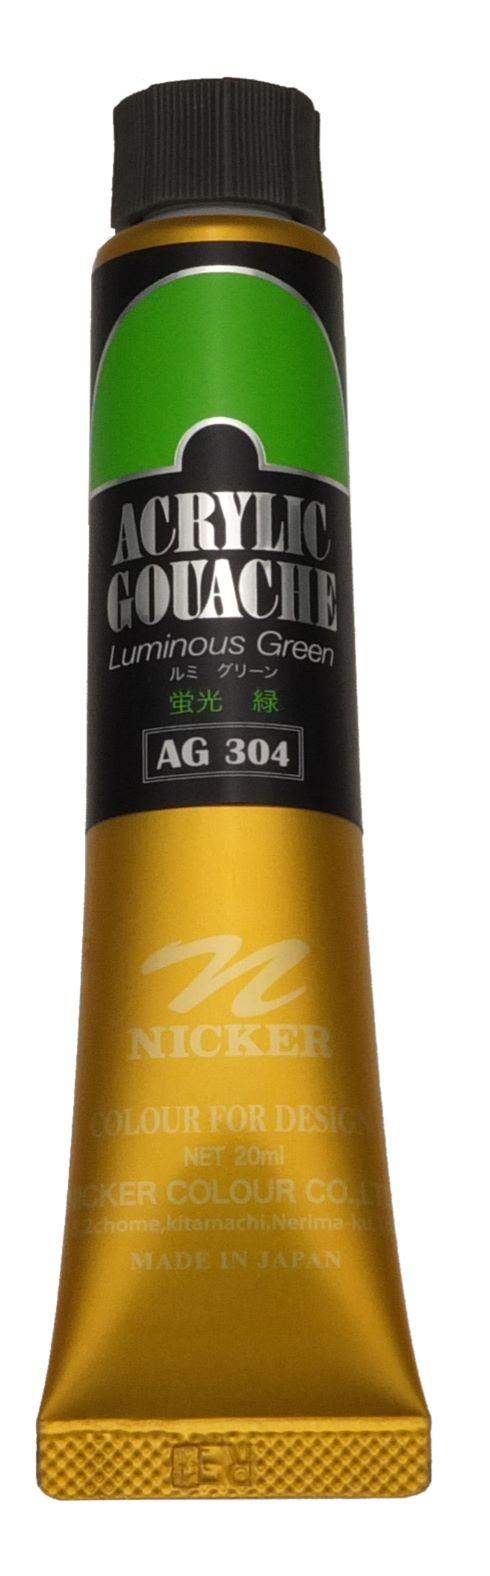 <Discontinued> ACRYLIC GOUACHE 20ml AG304 LUMINOUS GREEN